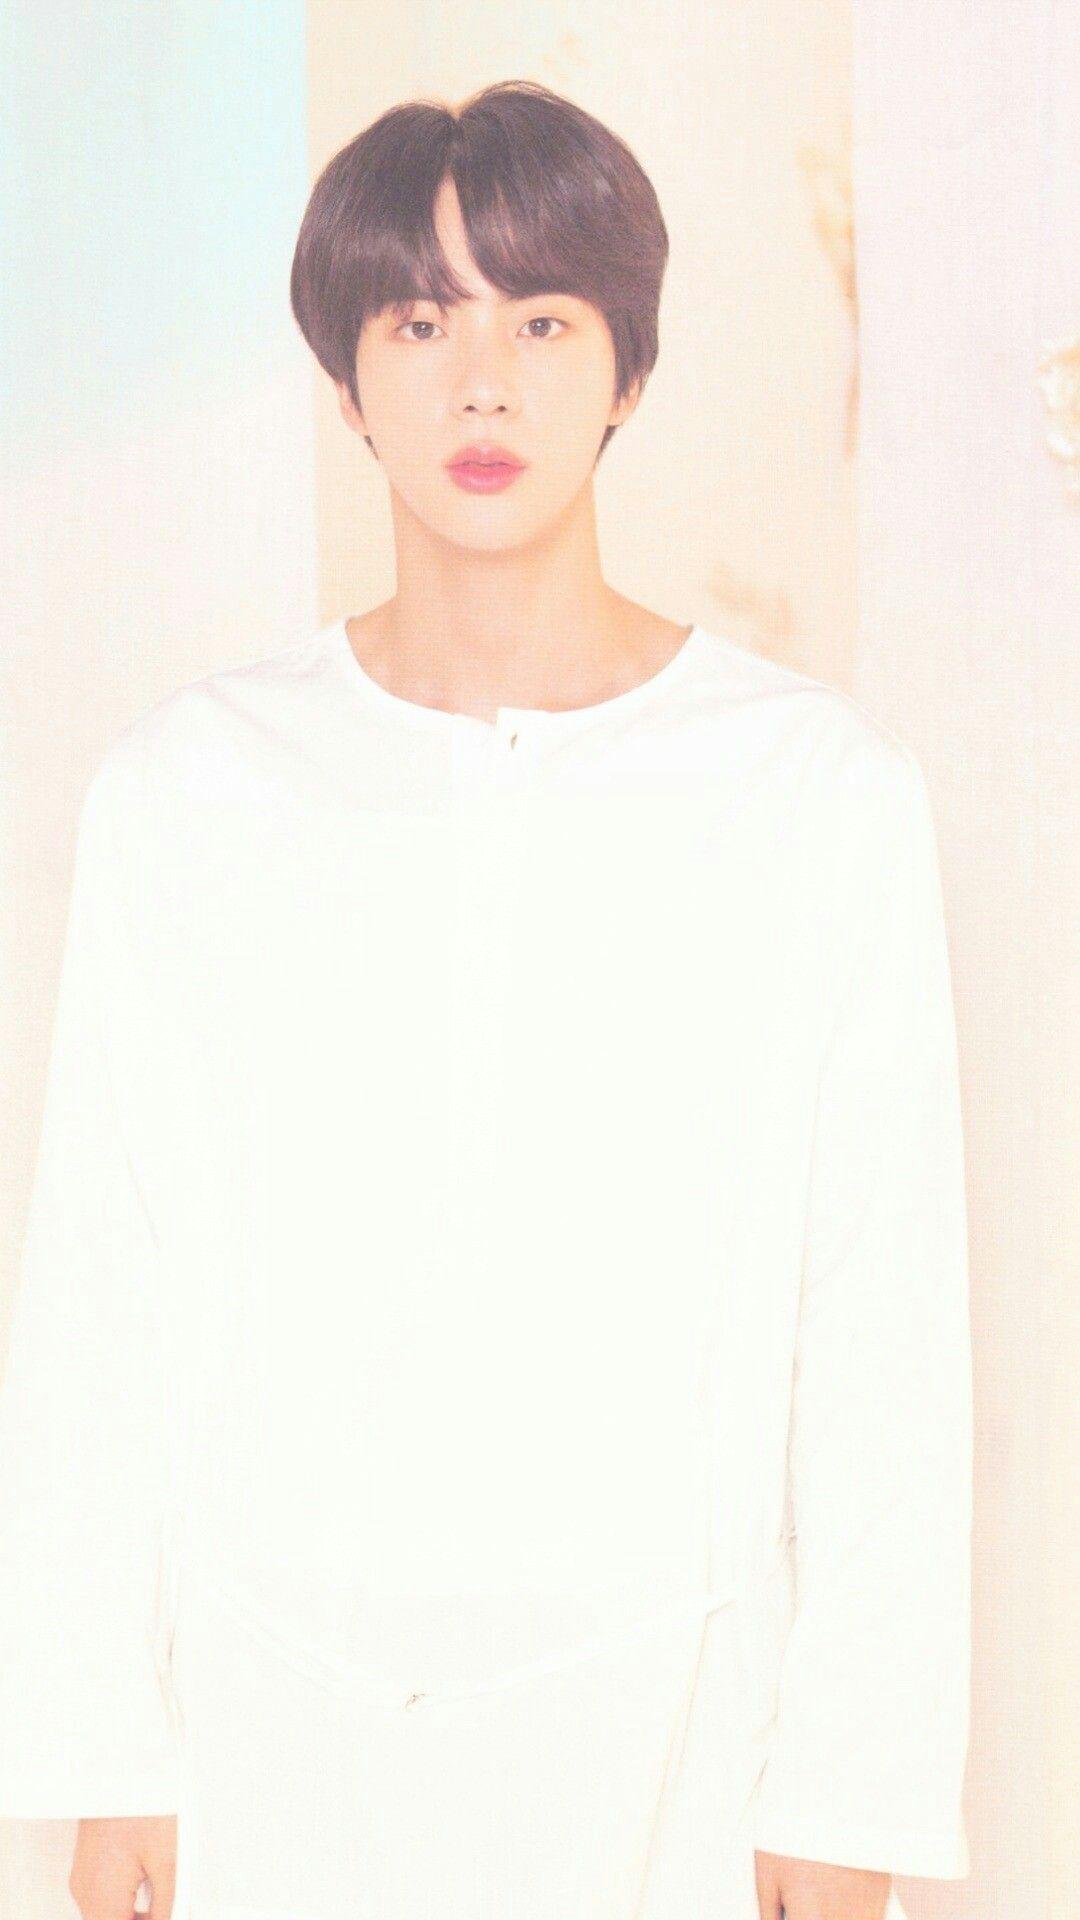 Bts Love Yourself Answer Jin Suga J Hope Rm Jimin V Y Jungkook Wallpaper Lockscreen Hd Fondo De Pantalla Bts Jin Jin Wallpaper Seokjin Worldwide Handsome Bts jin iphone wallpaper hd